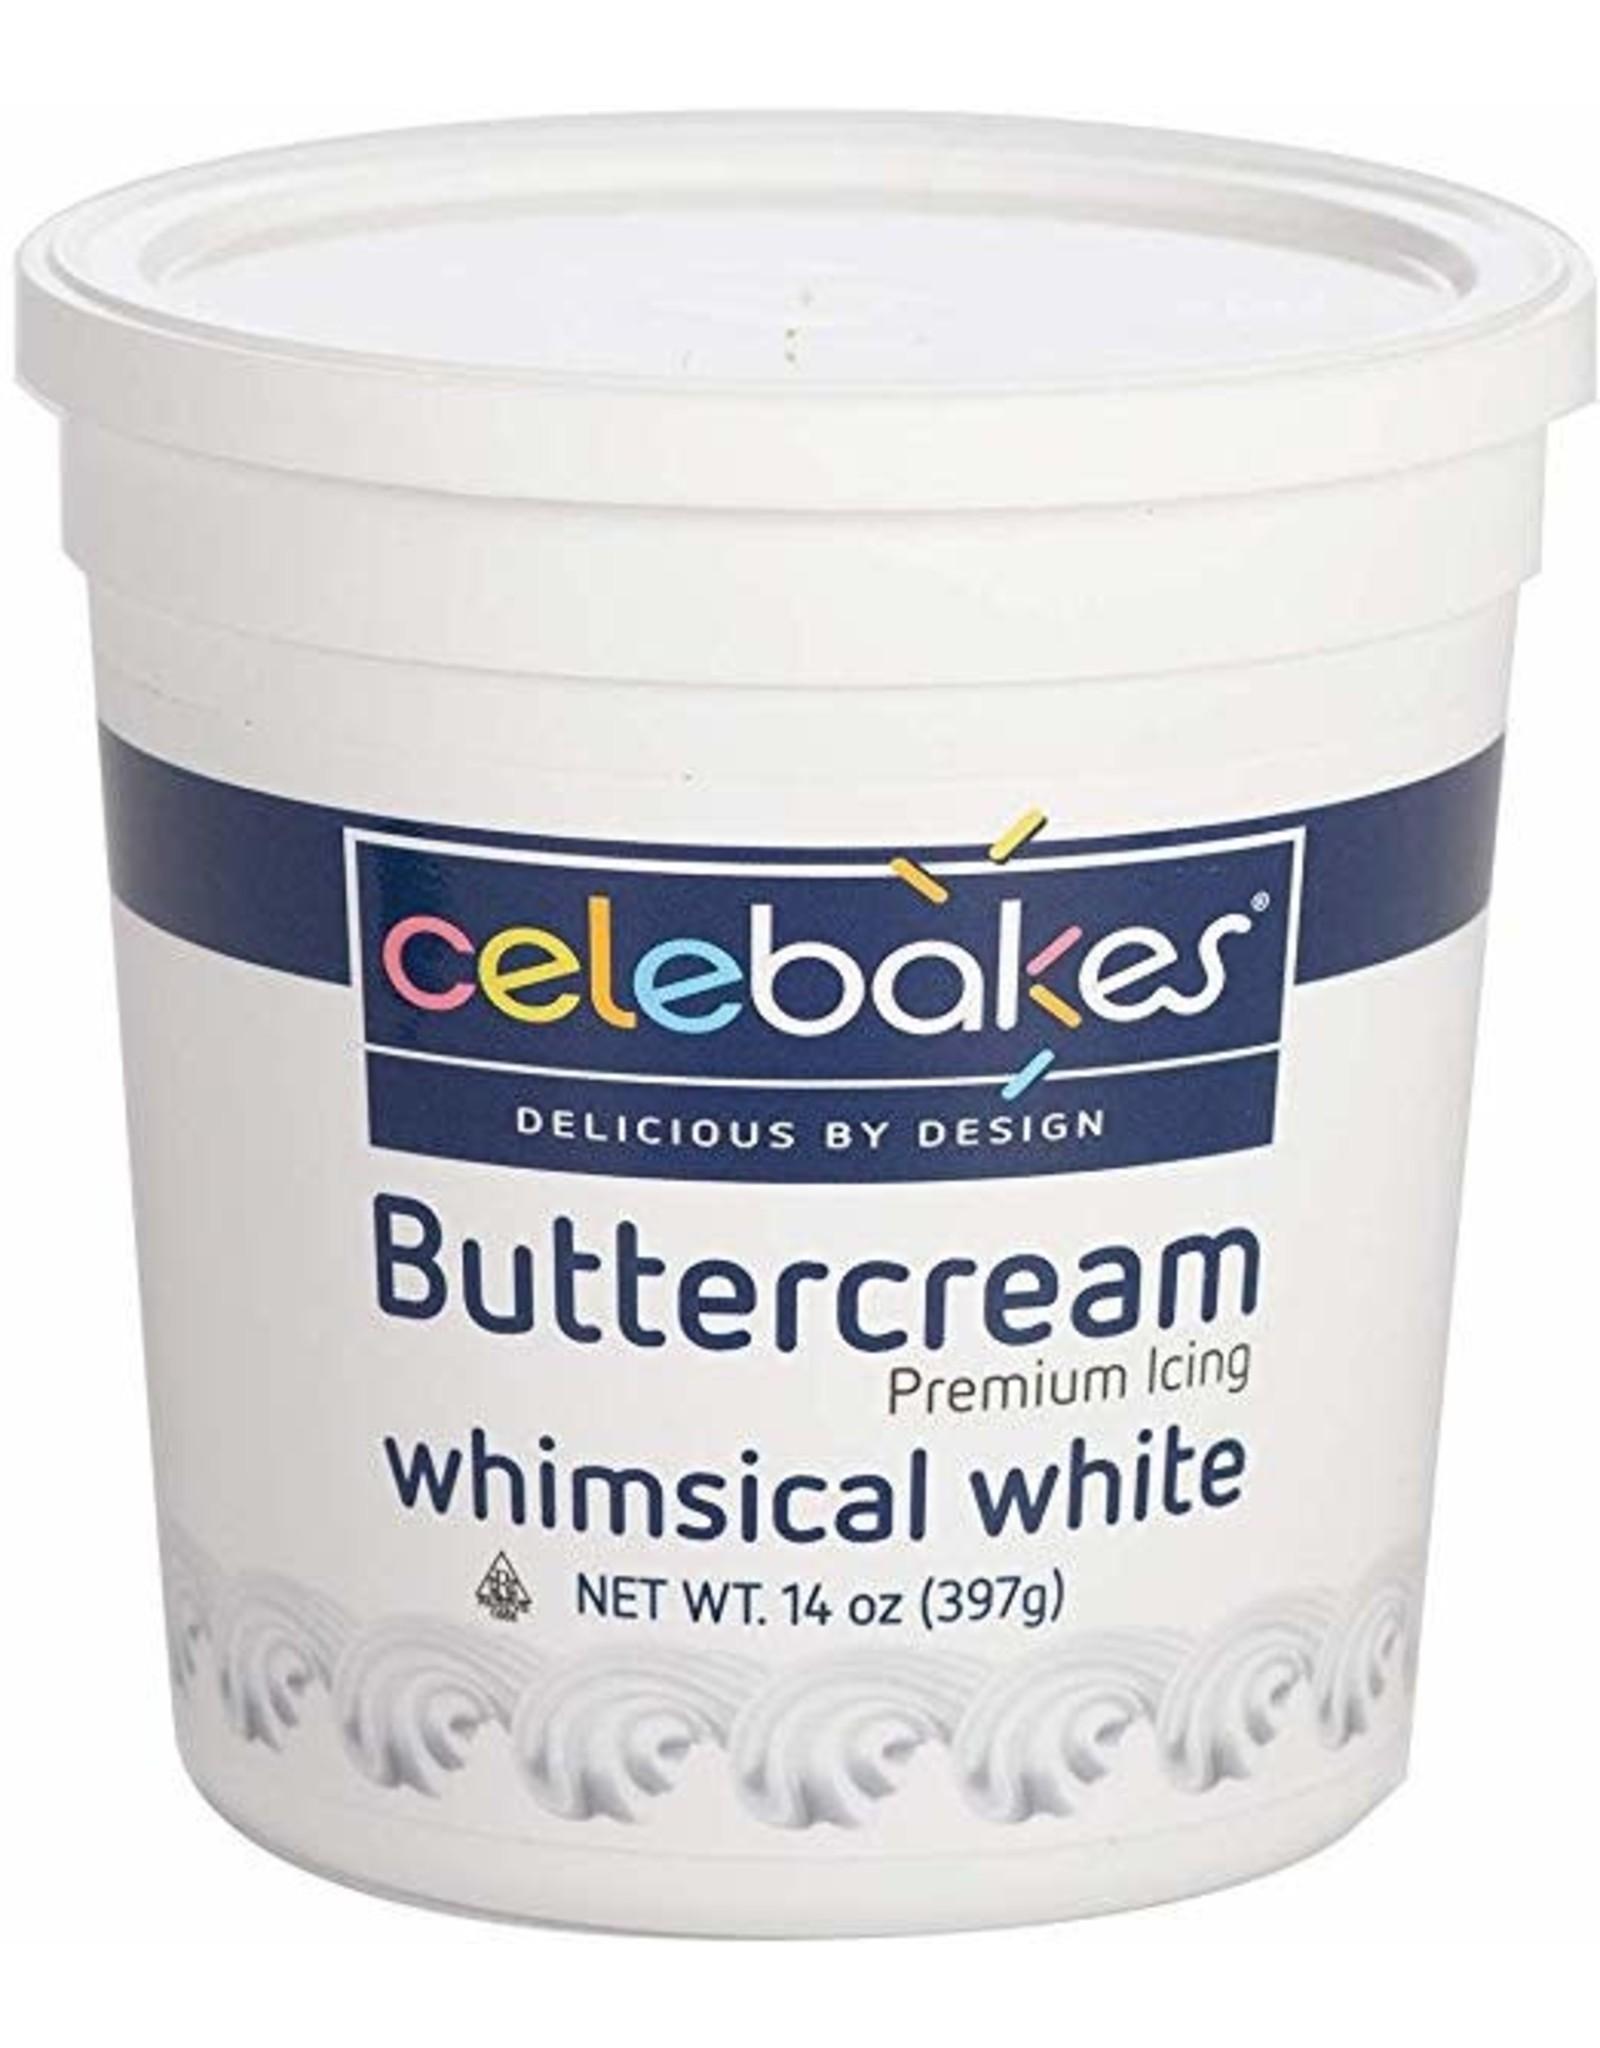 14 oz White Buttercream Icing